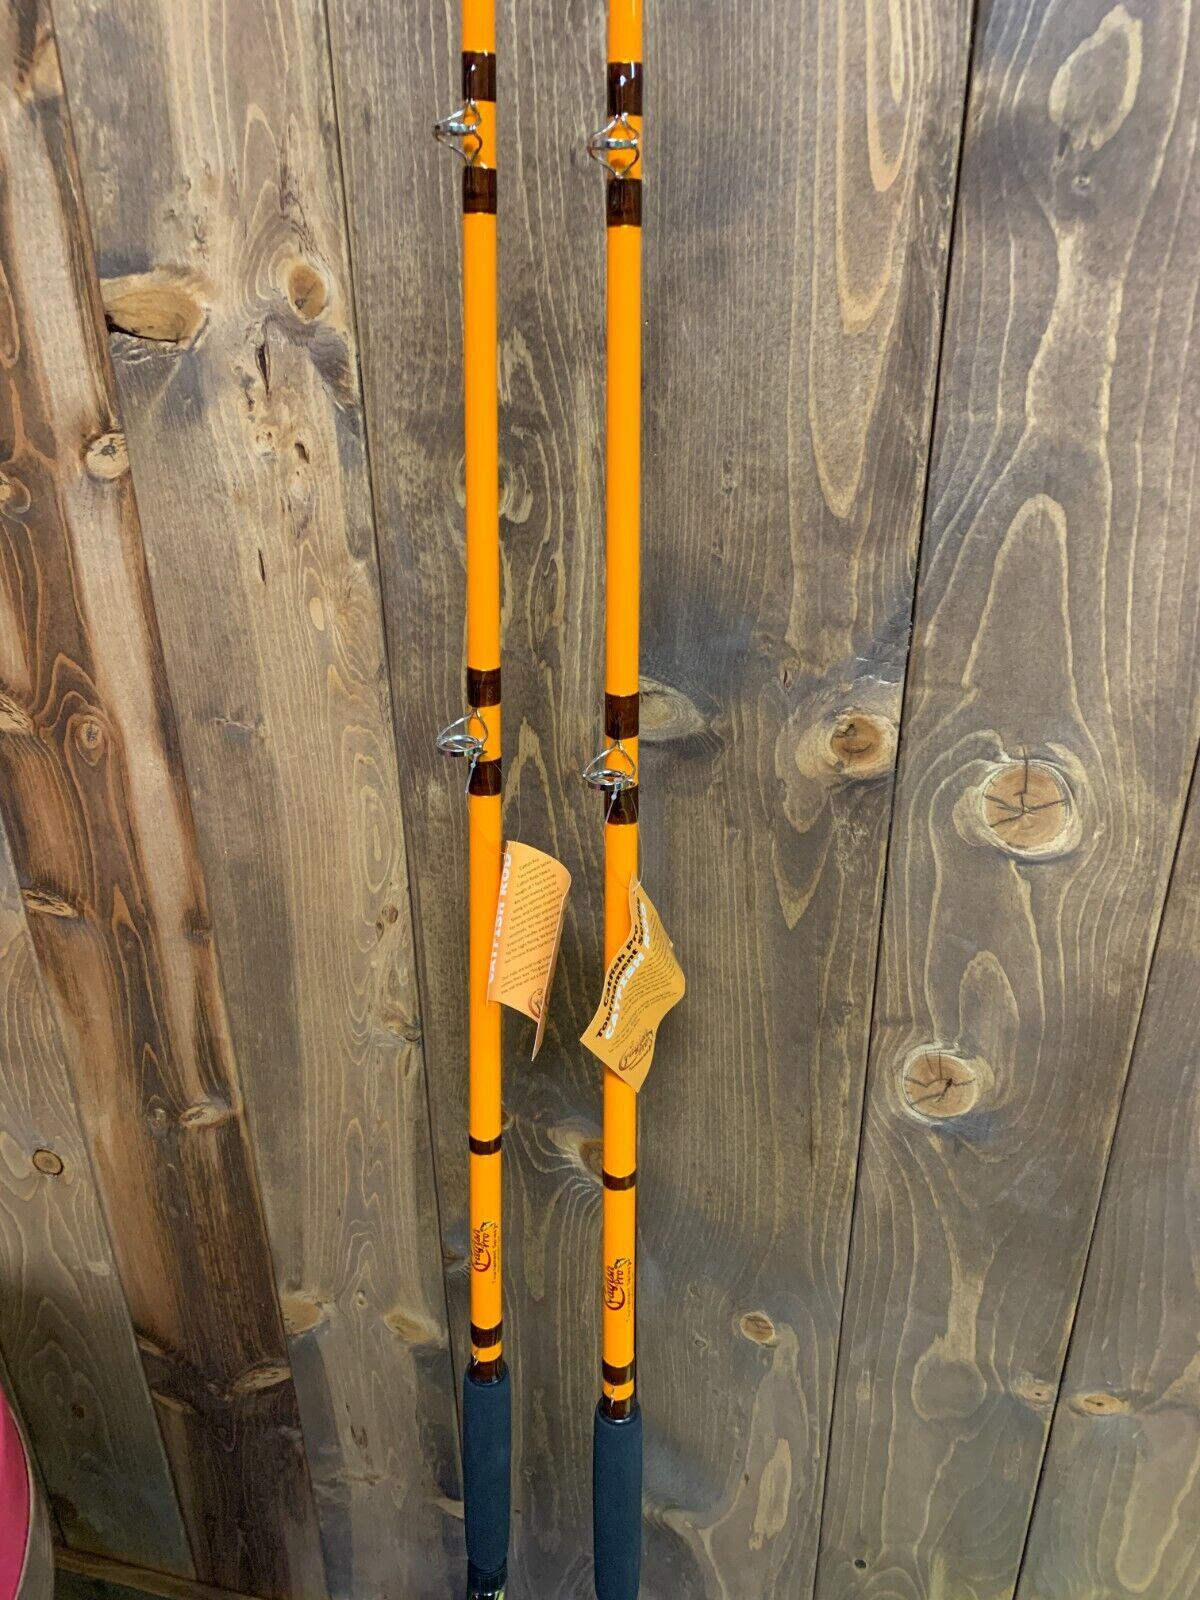 Catfish Pro Tournament Series Casting Fishing Rod 7'6 Medium